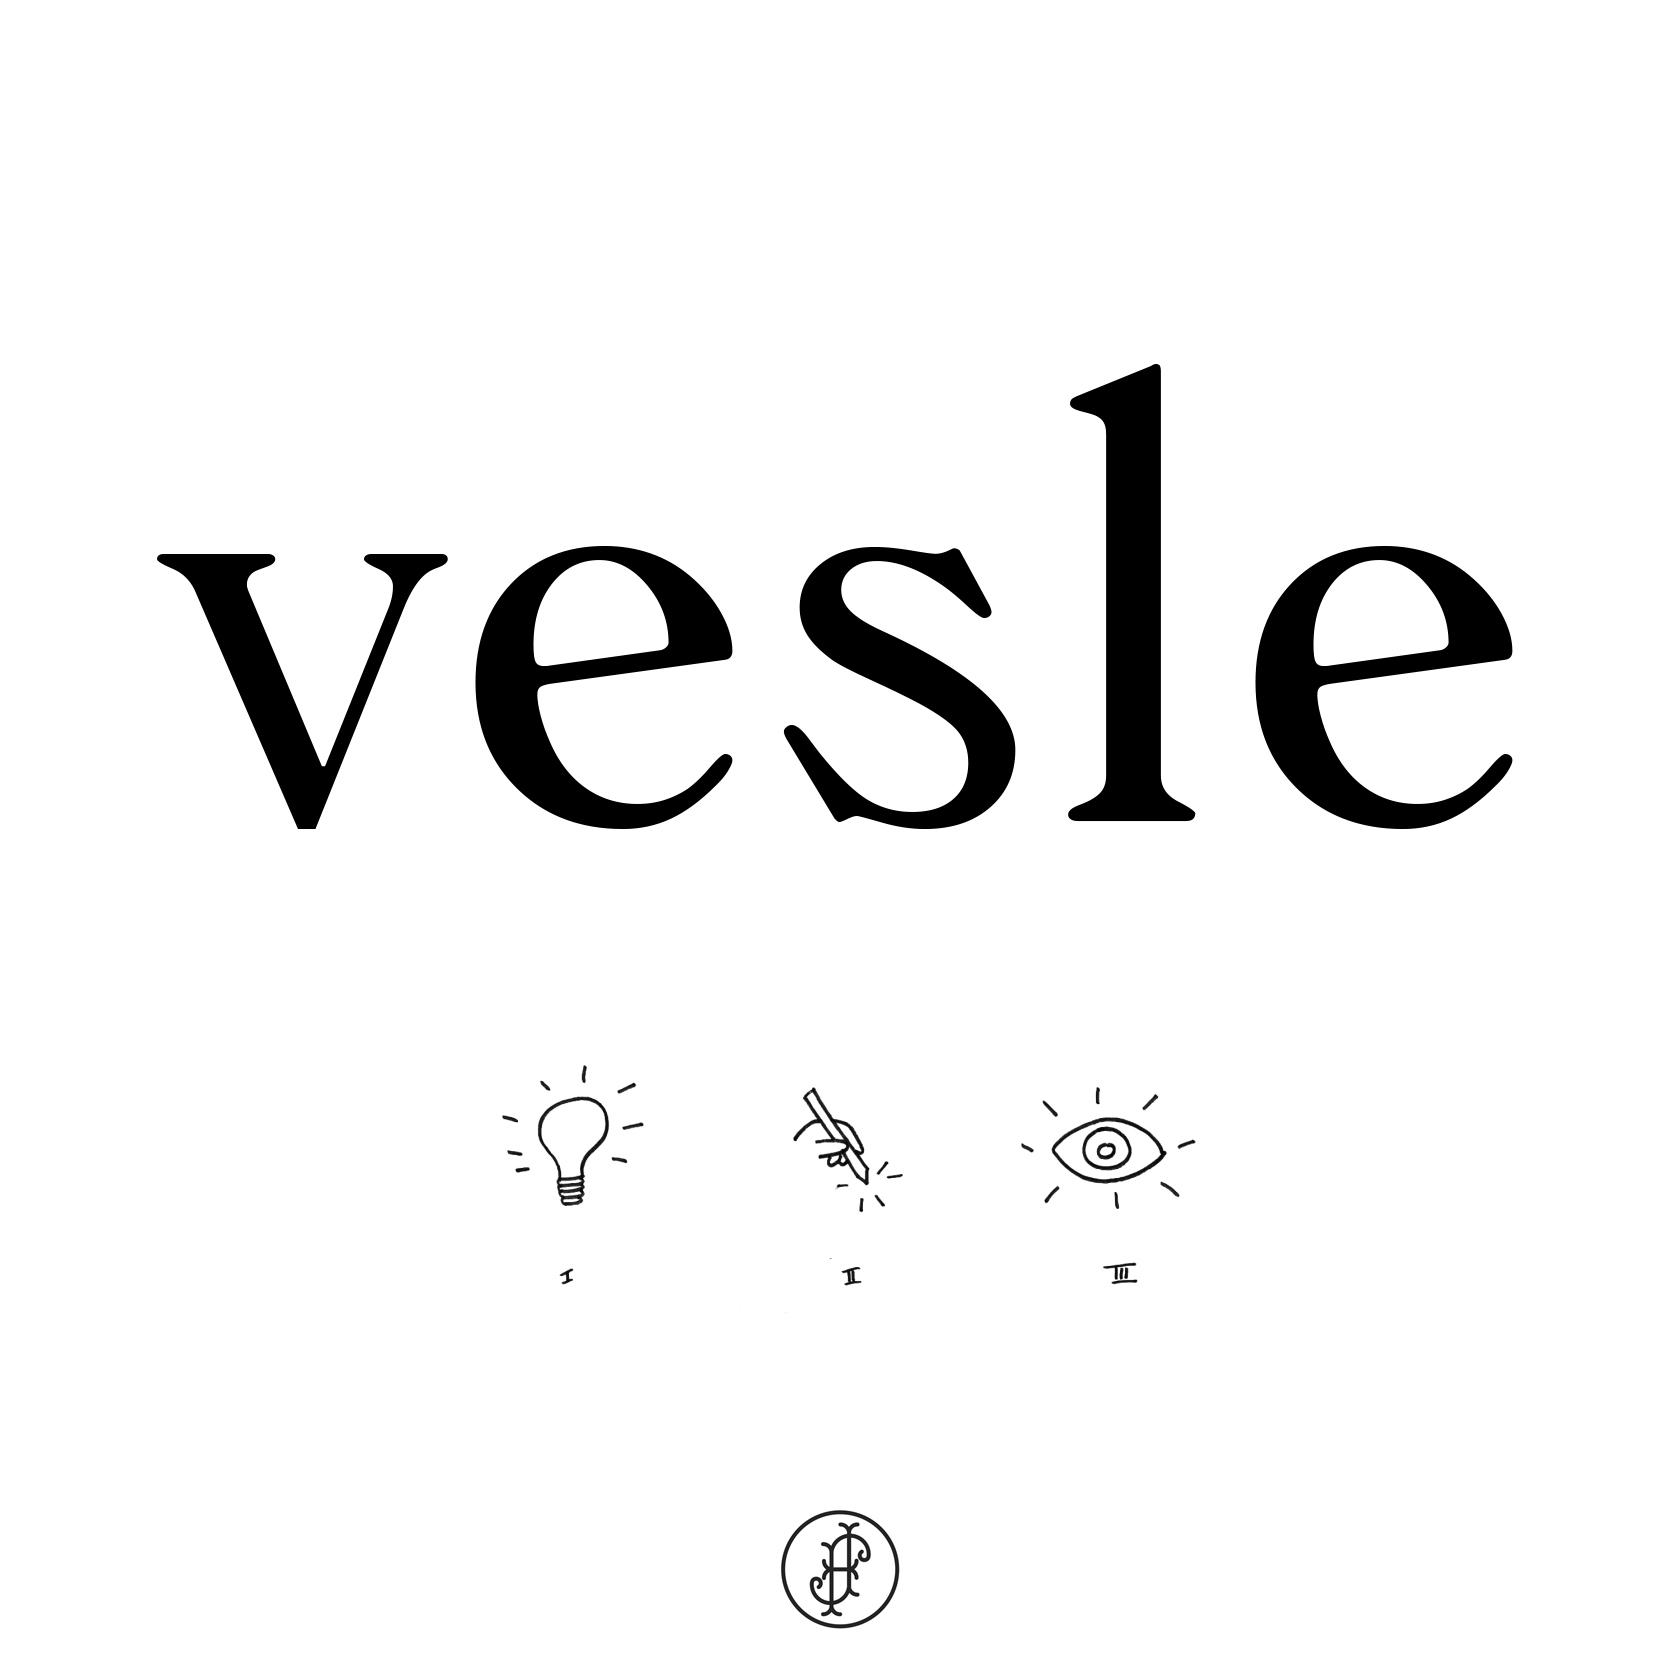 vesle-juljac-monogram-21